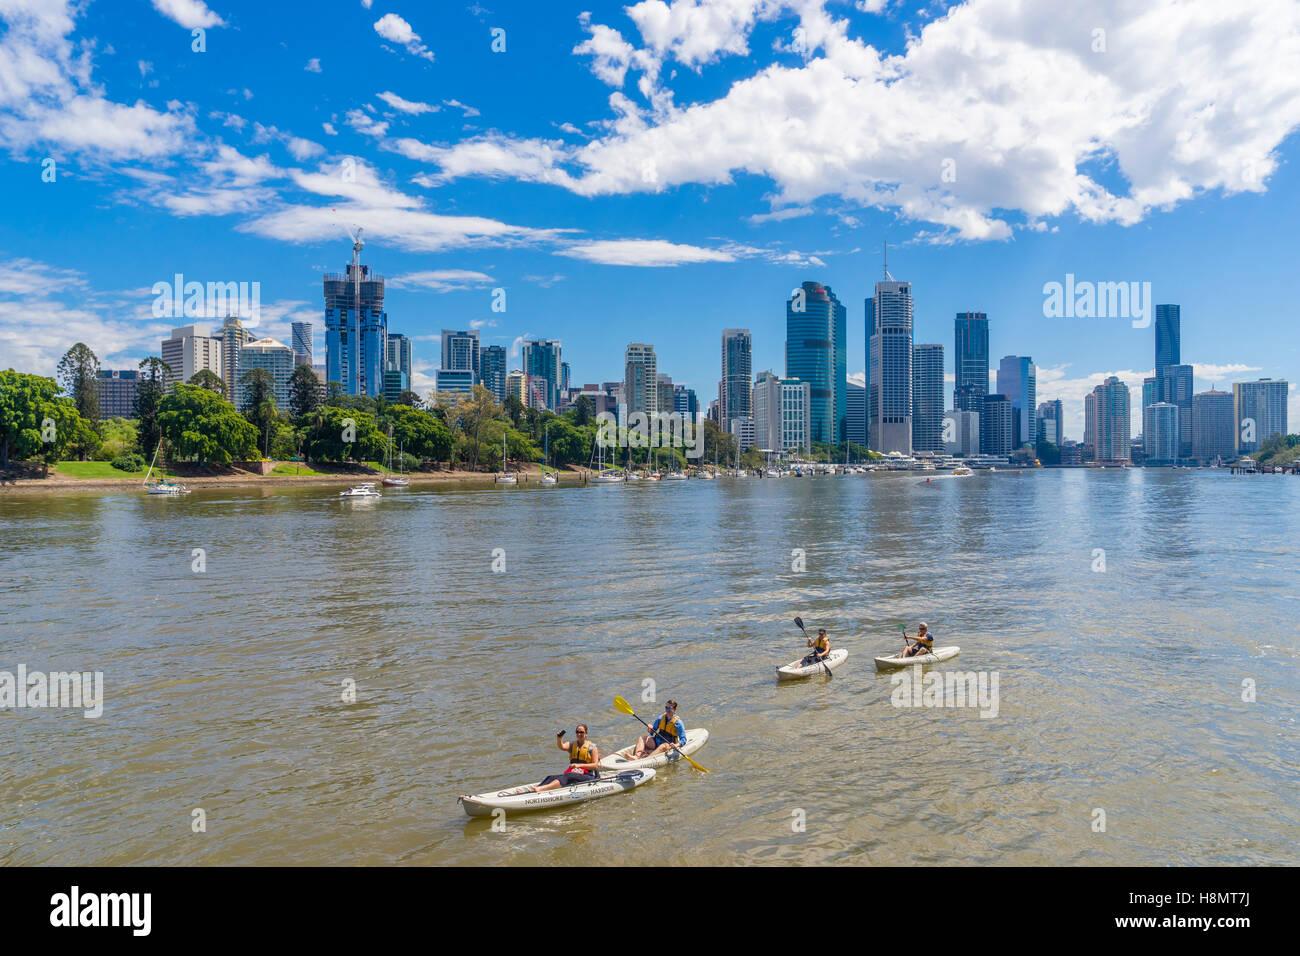 Tourists kayaking along the Brisbane River, Australia - Stock Image